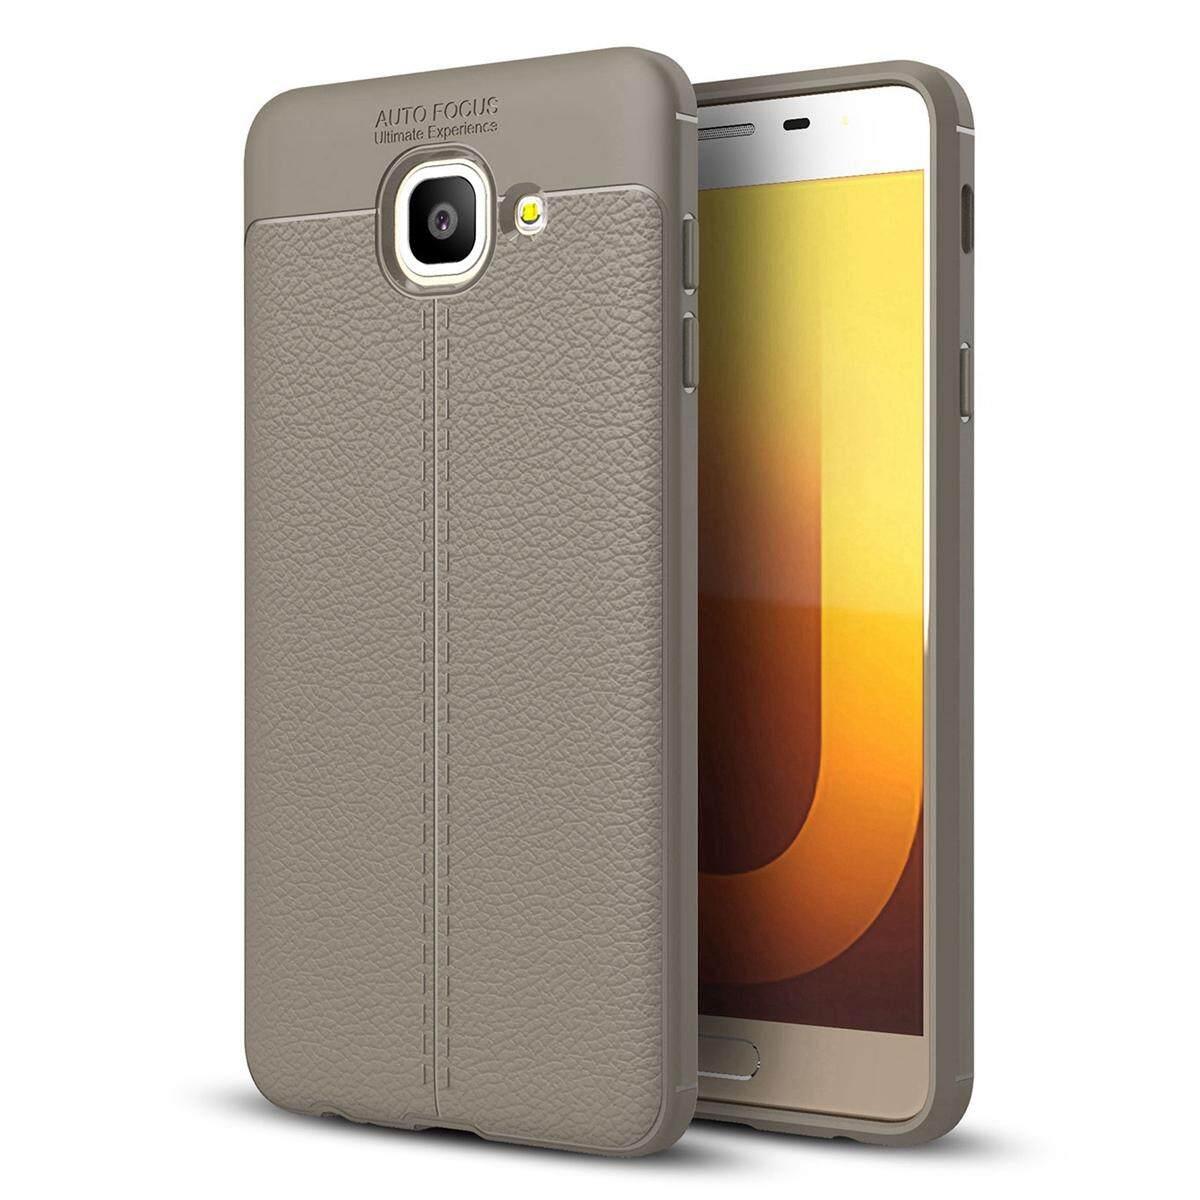 Samsung GALAXY J7 Max/Samsung Galaxy Di Max Case, lenuo Karbon Fashion Ultra Tipis Kulit Penutup Belakang Premium TPU Penutup Pelindung-Intl